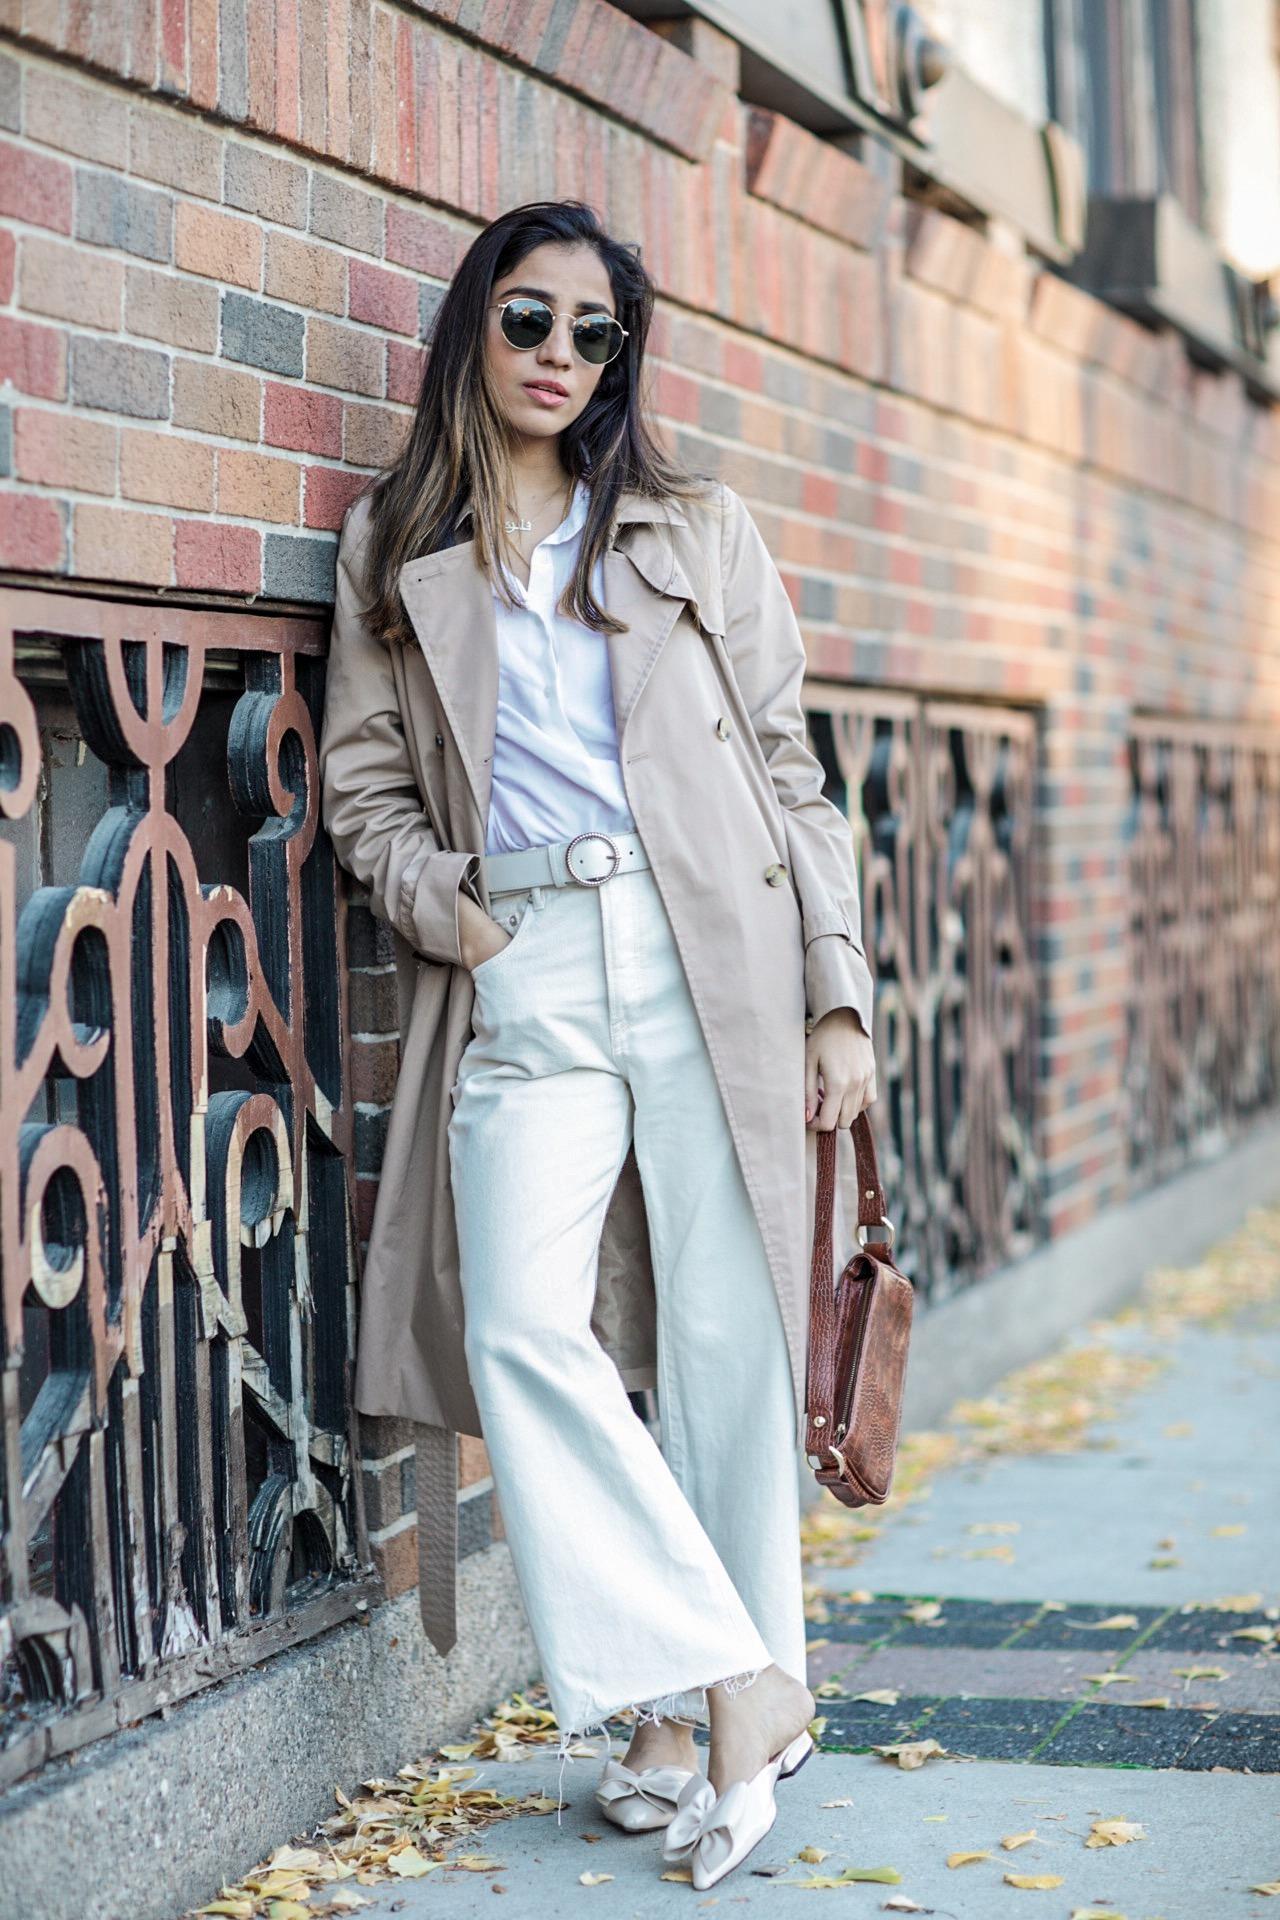 Our Top ShopBop Sale Finds Fall Wear Fashion Forward Faiza Inam 2019 2